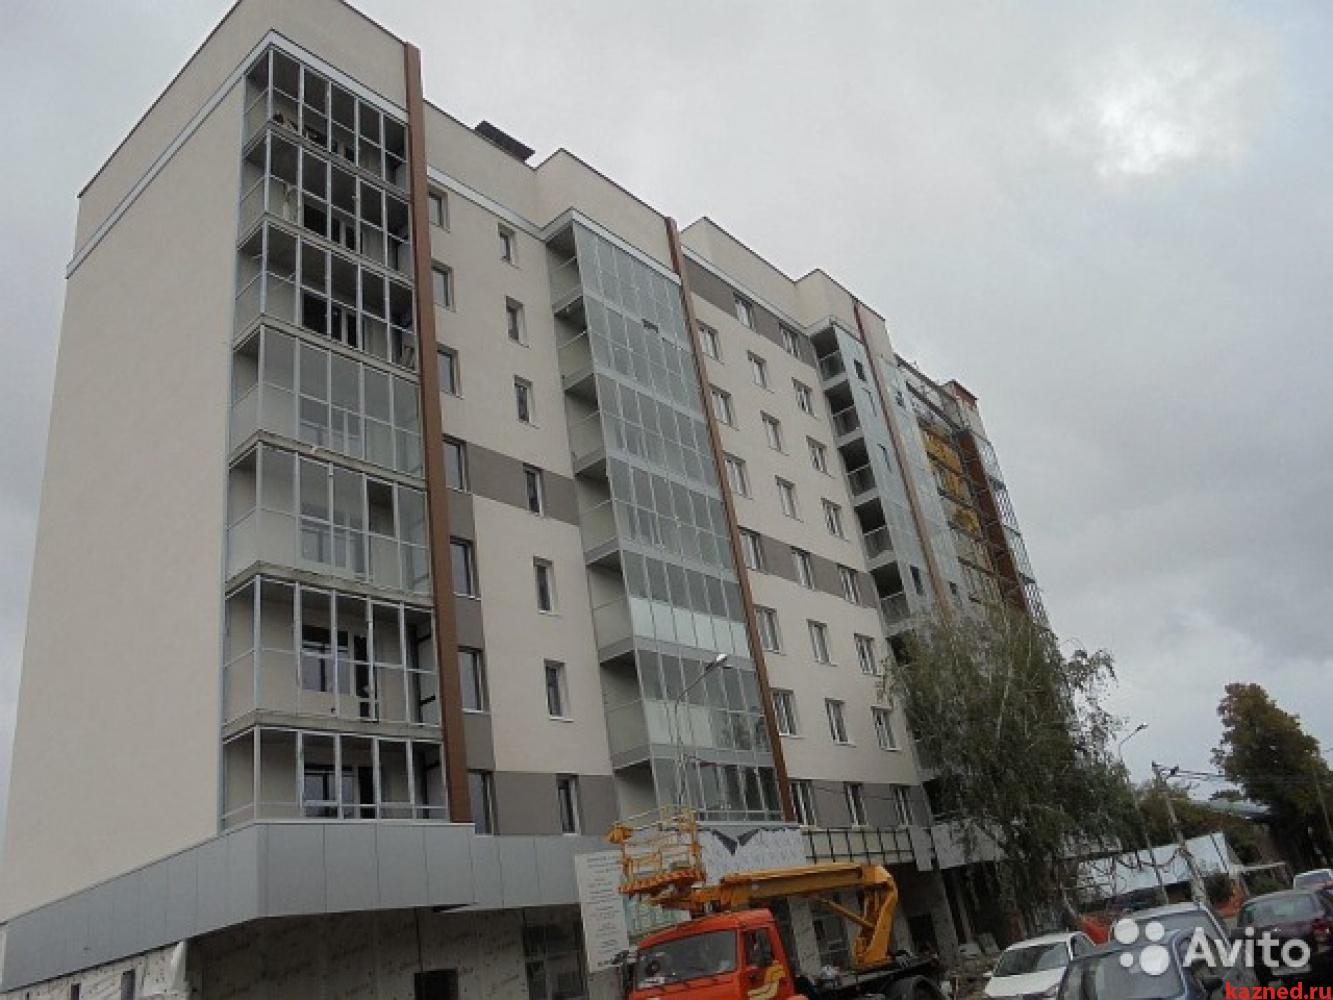 Продажа 1-к квартиры Шуртыгина,8, 47 м2  (миниатюра №3)